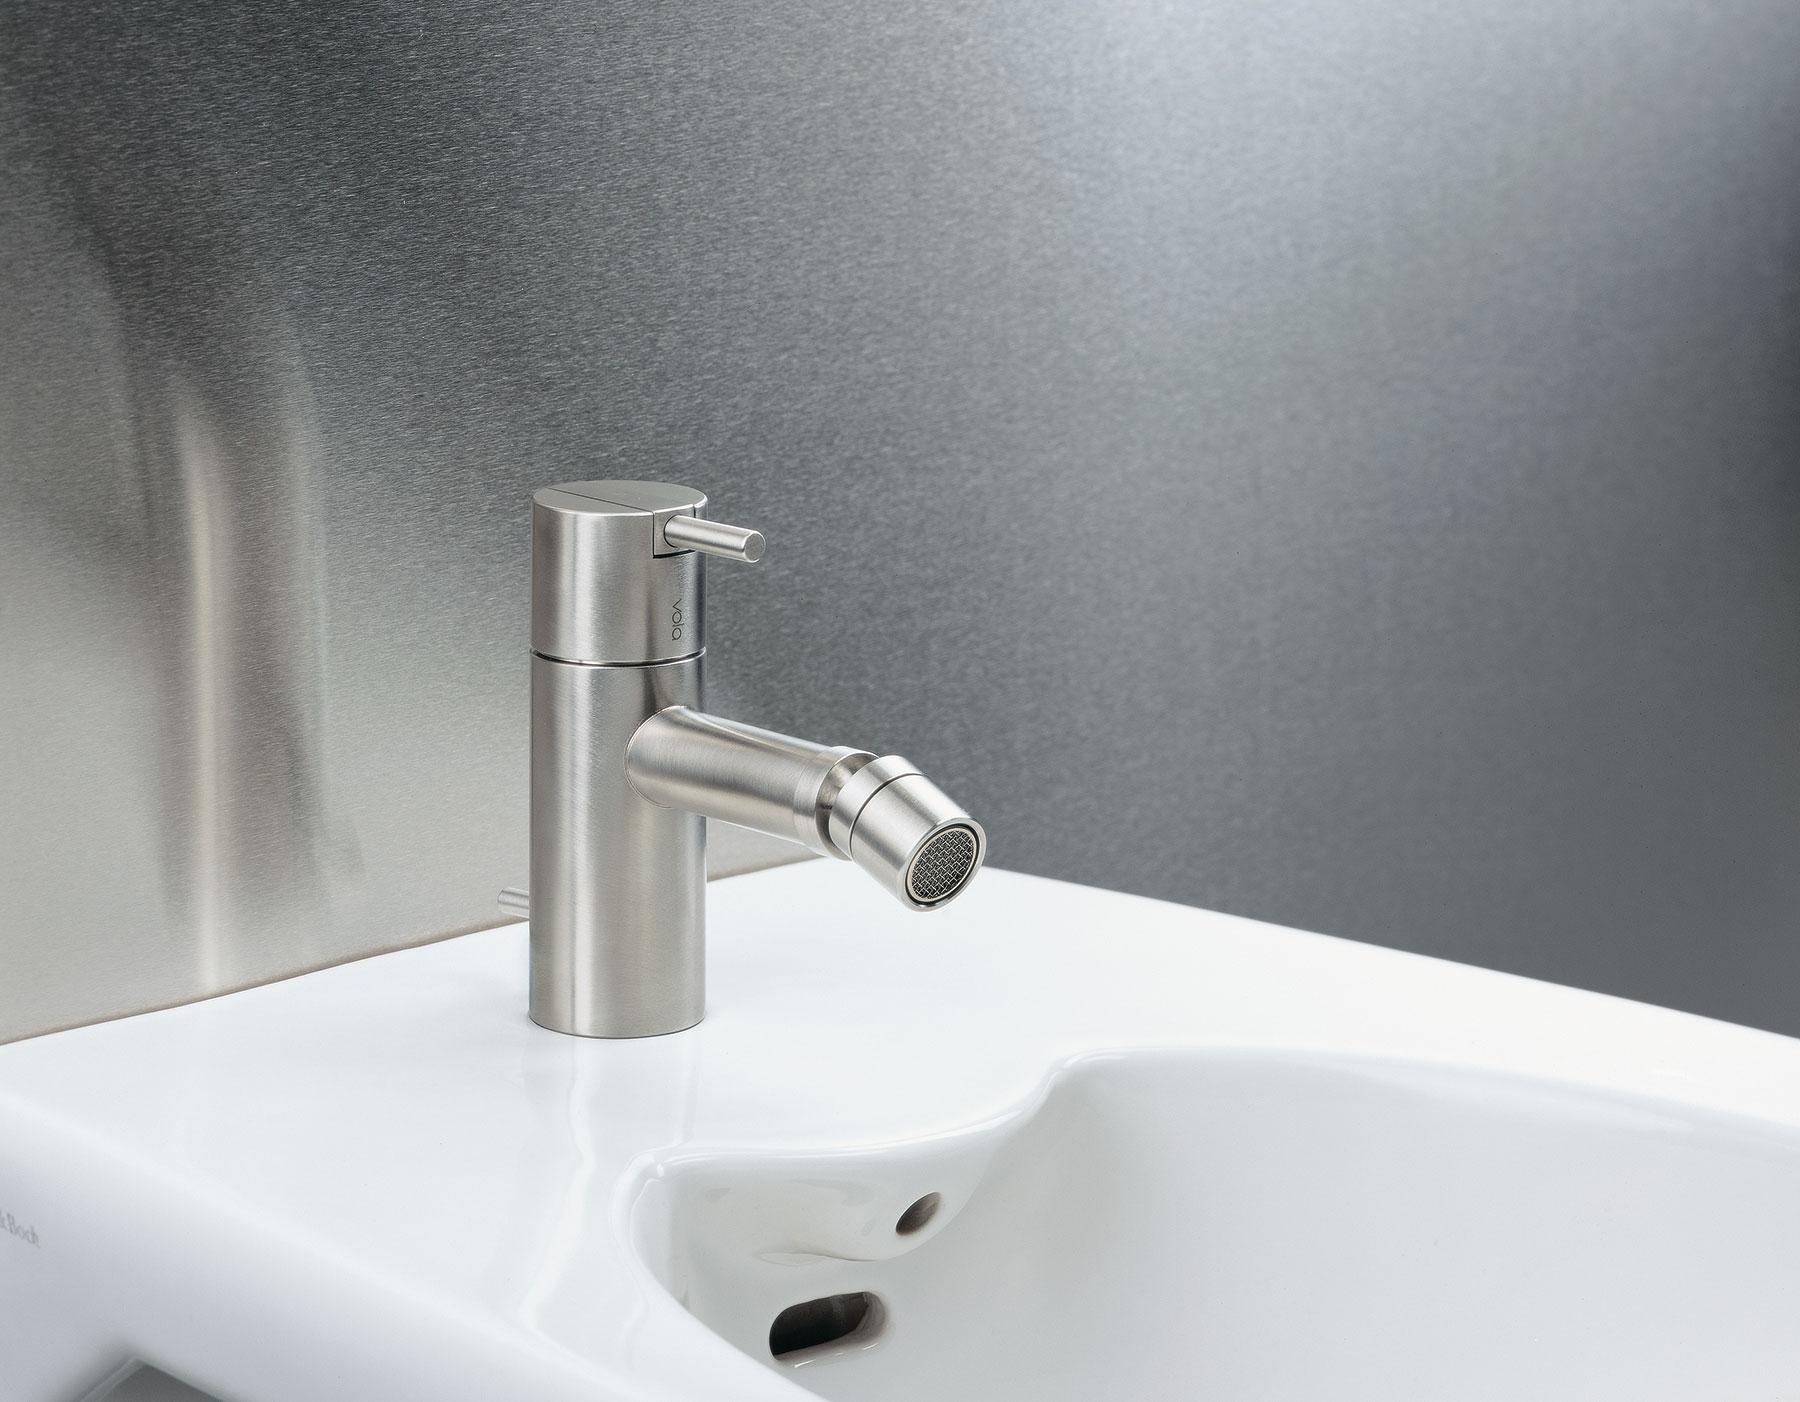 Transitional Vola Deck Mount Bidet Faucet